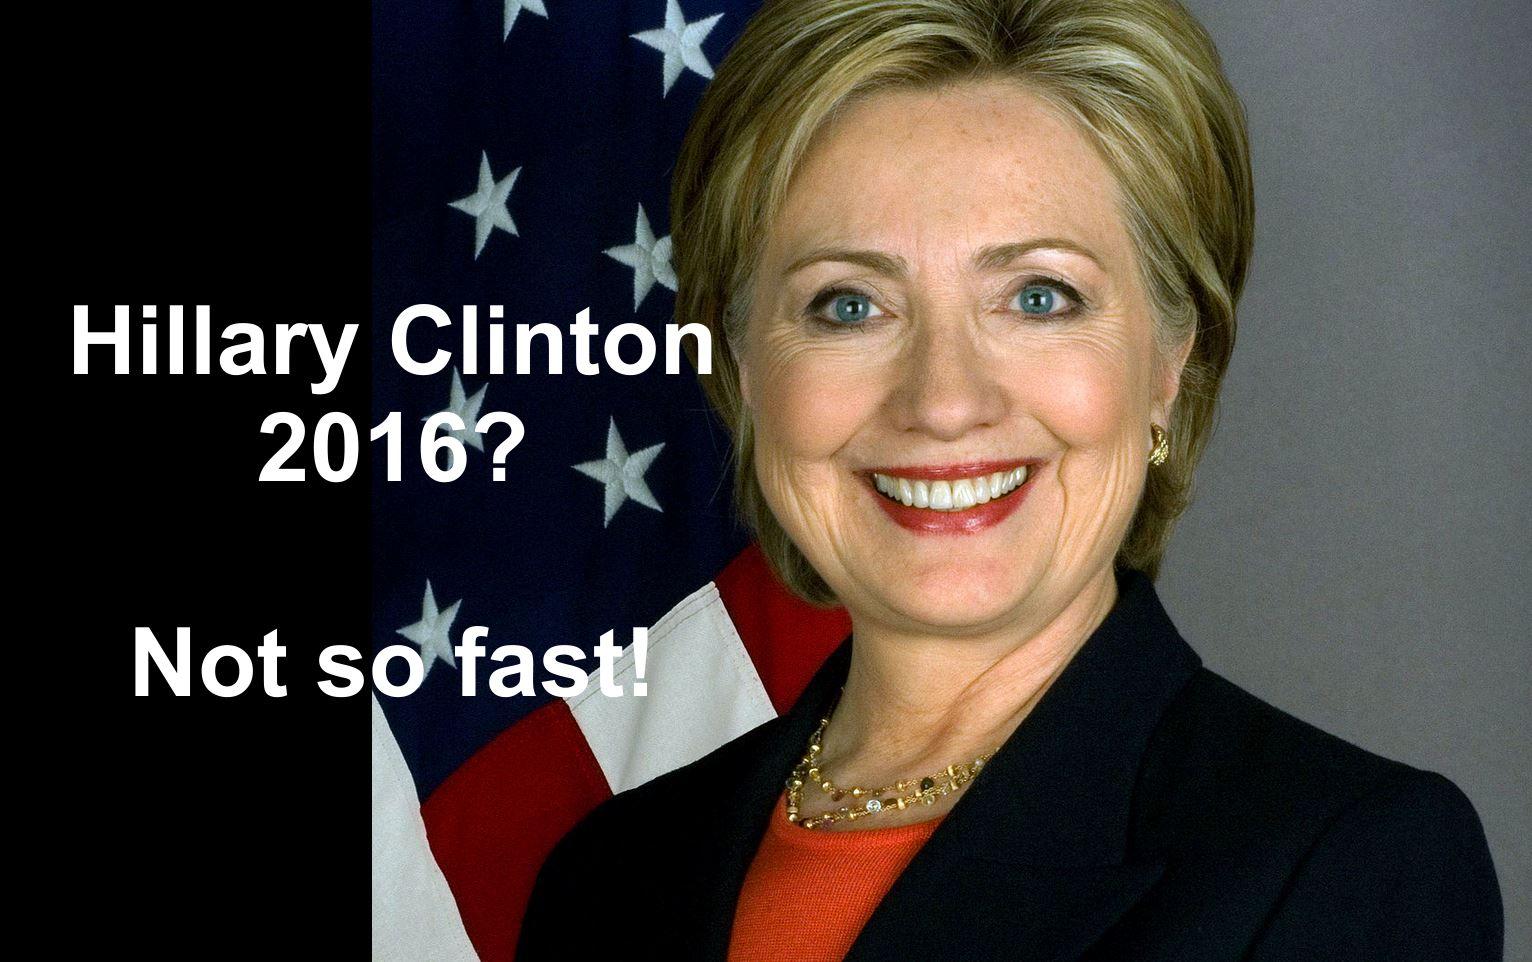 Hillary Clinton 2016 Democrats